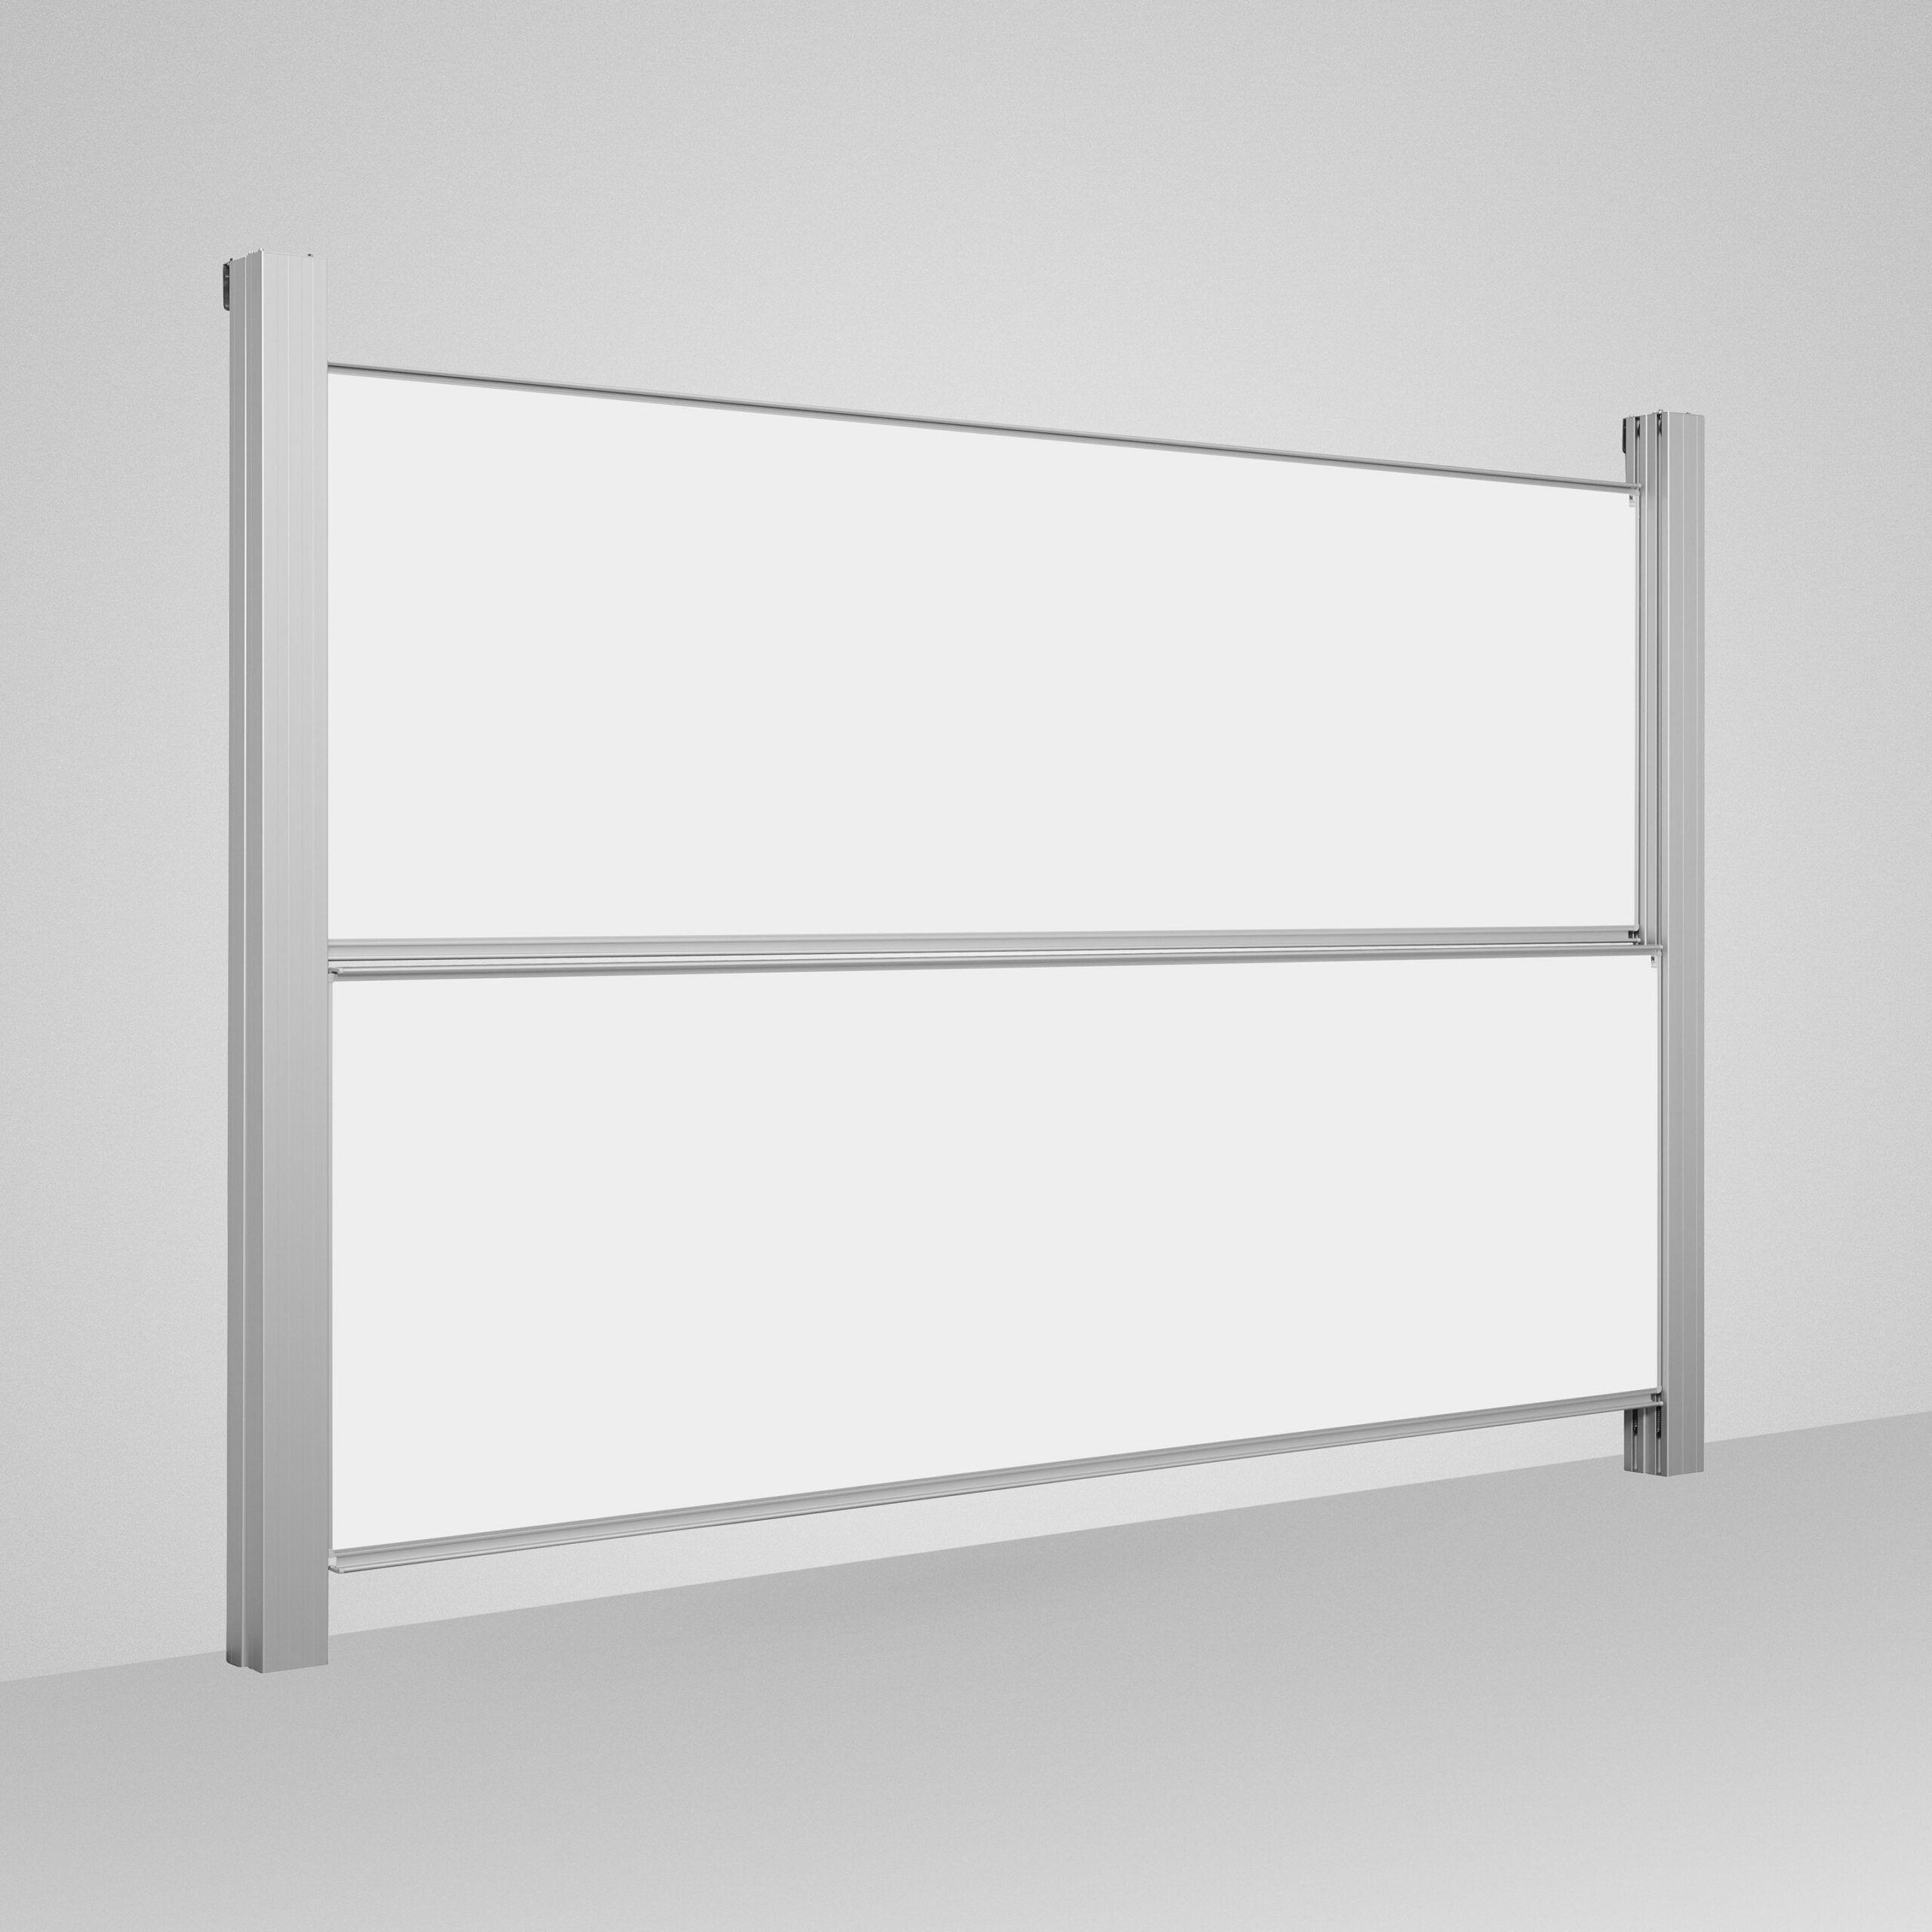 Flow-hejsetavler-whiteboard_02